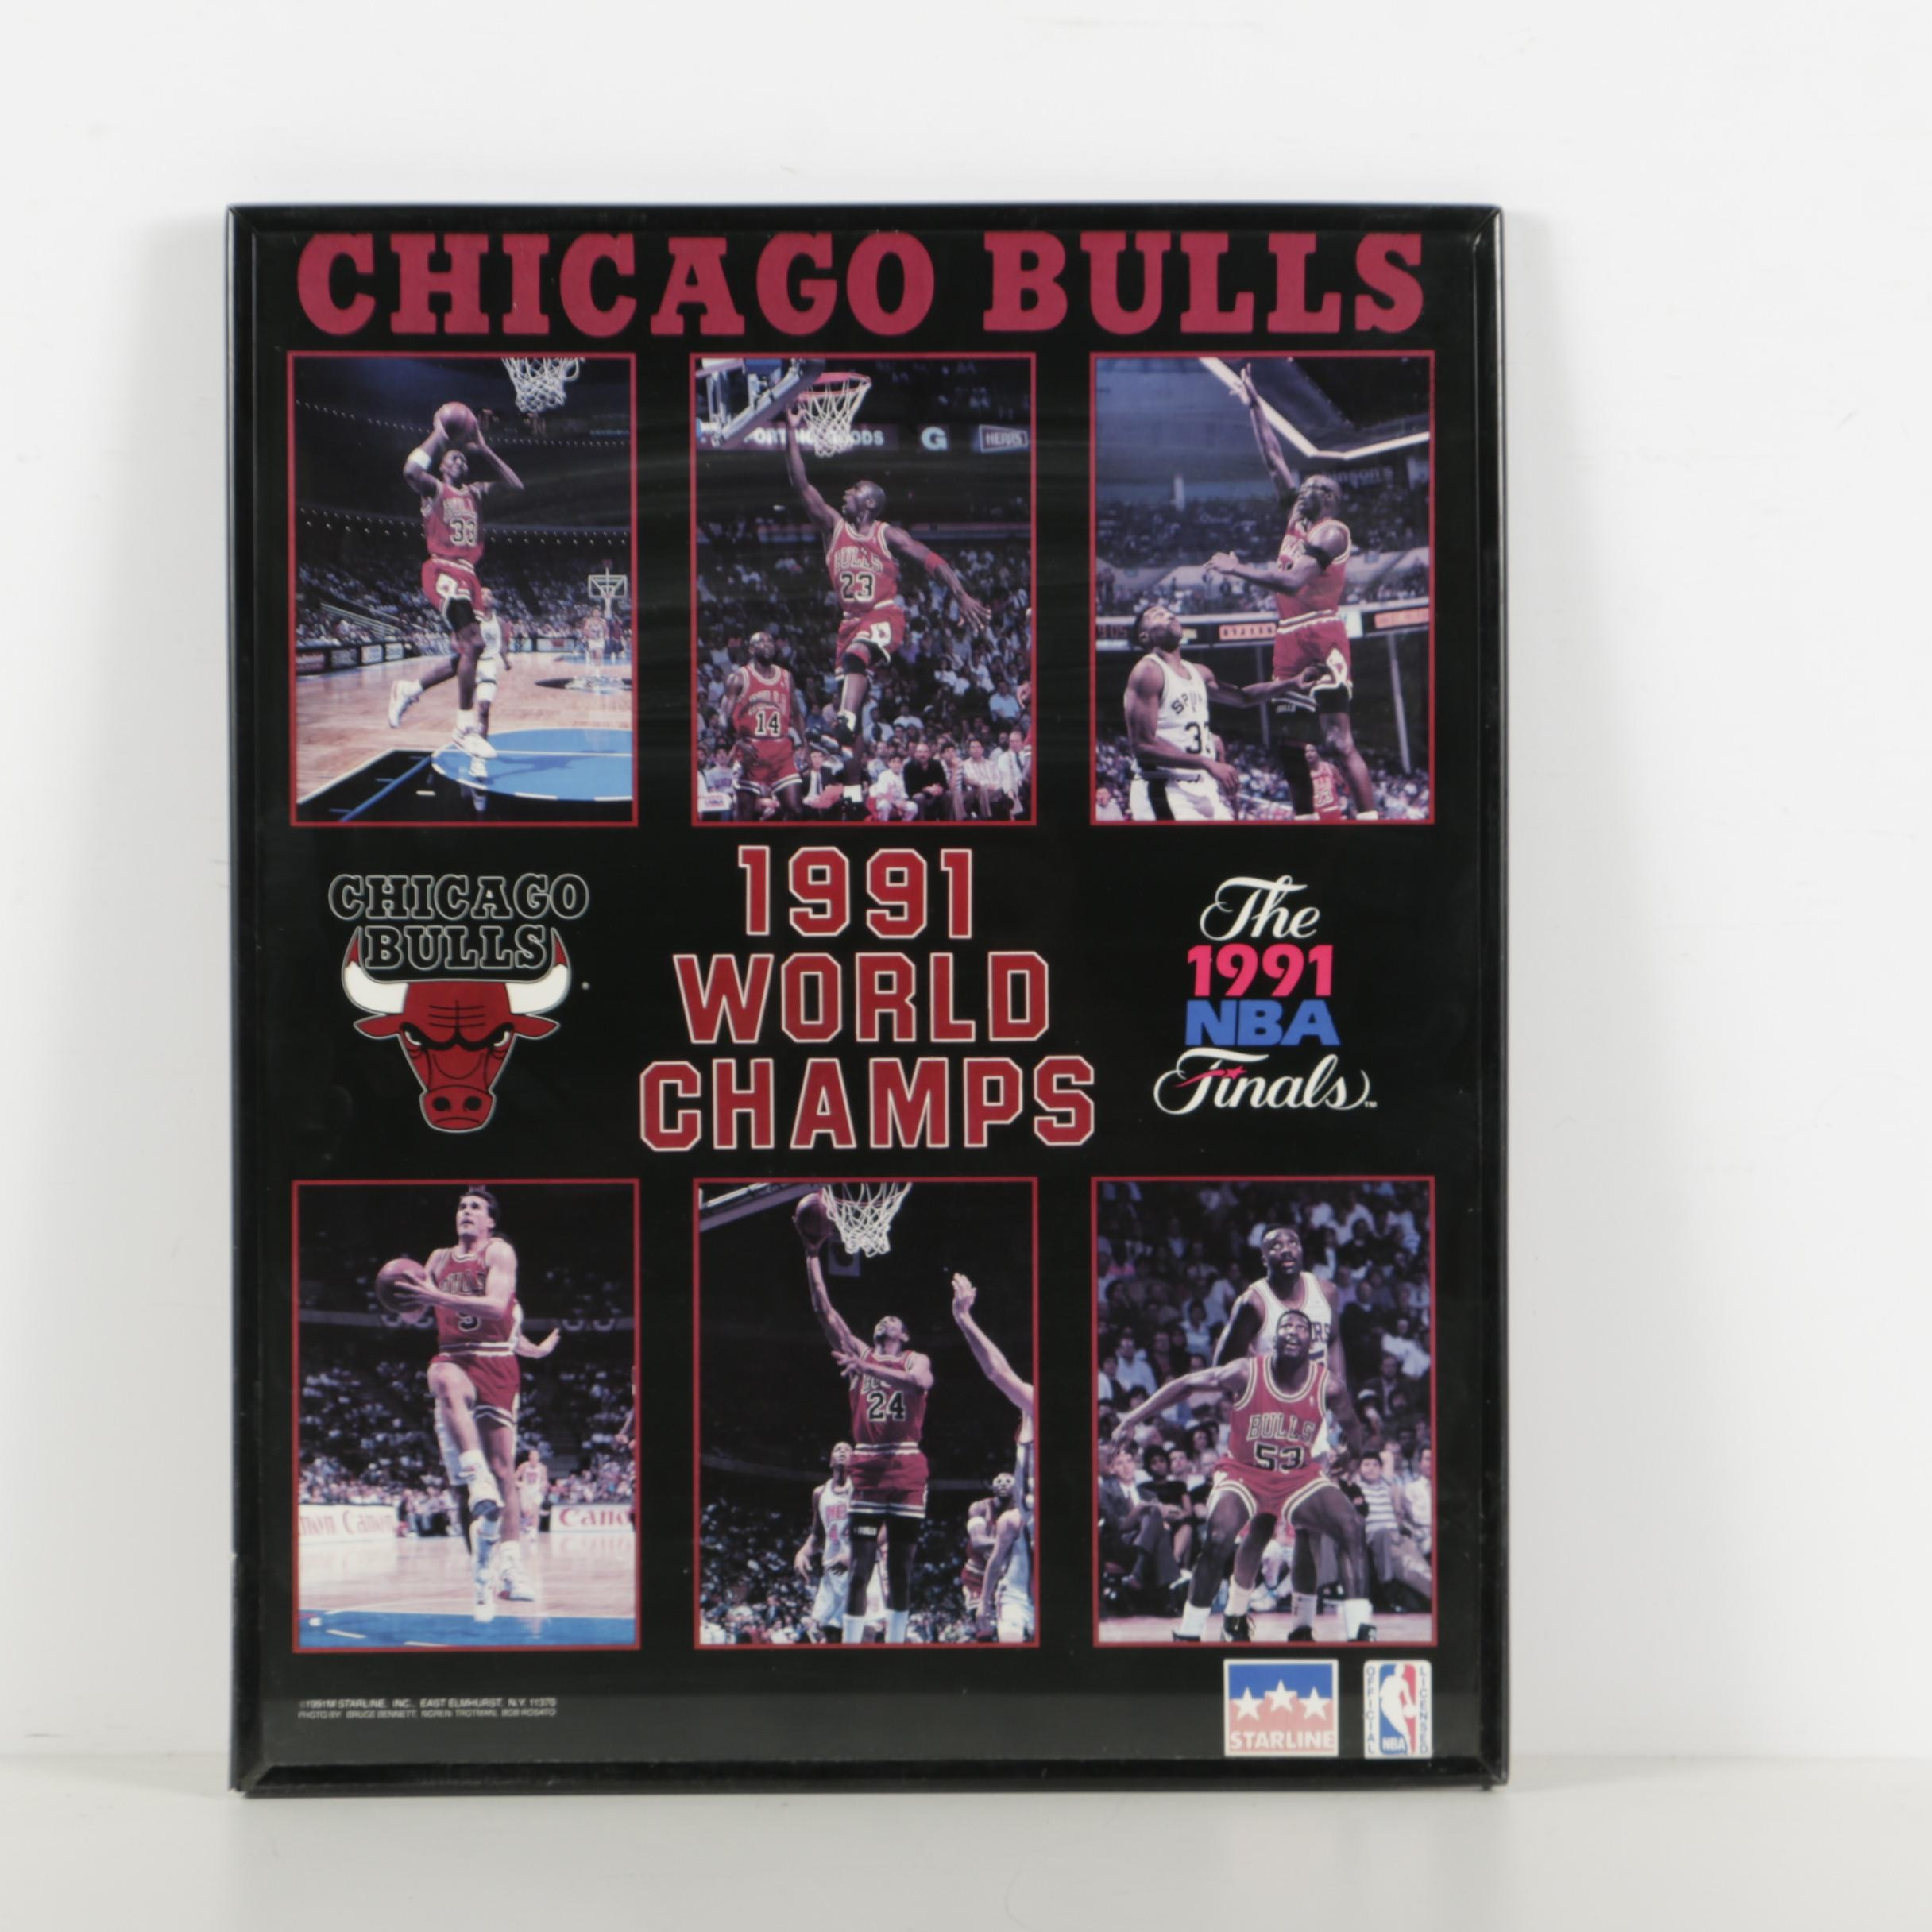 Chicago Bulls 1991 World Champs Poster : EBTH